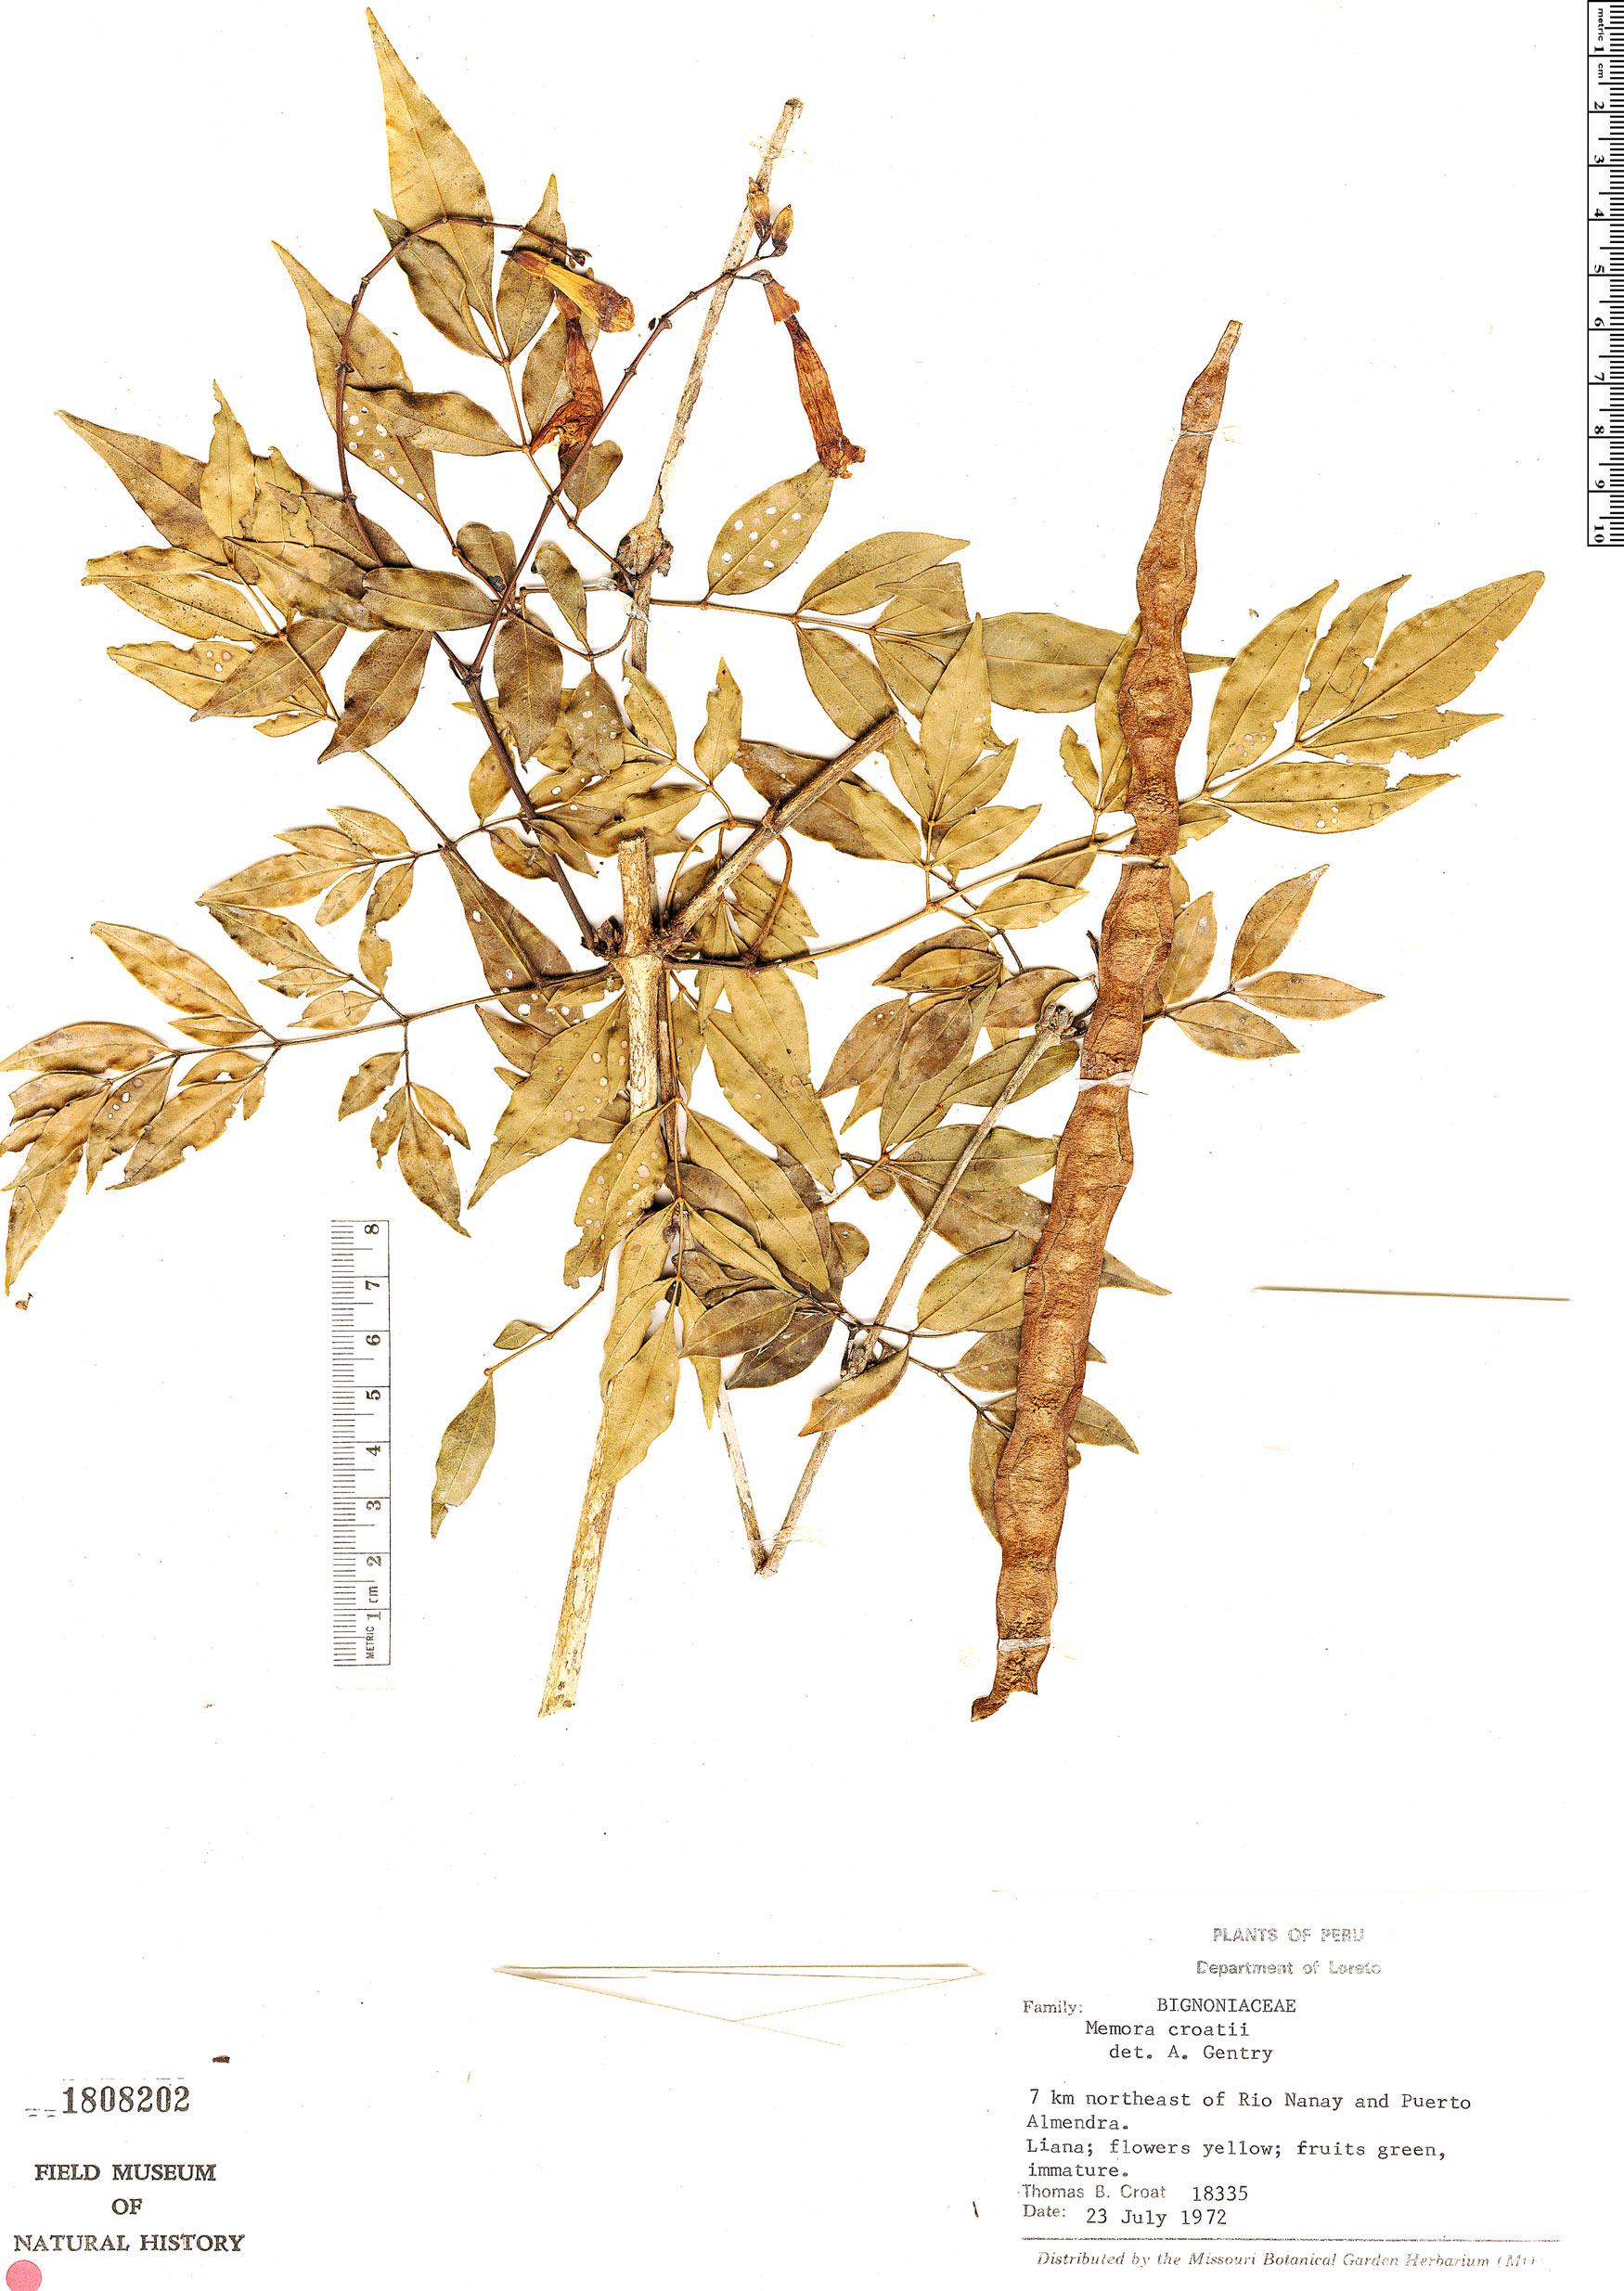 Specimen: Adenocalymma croatii